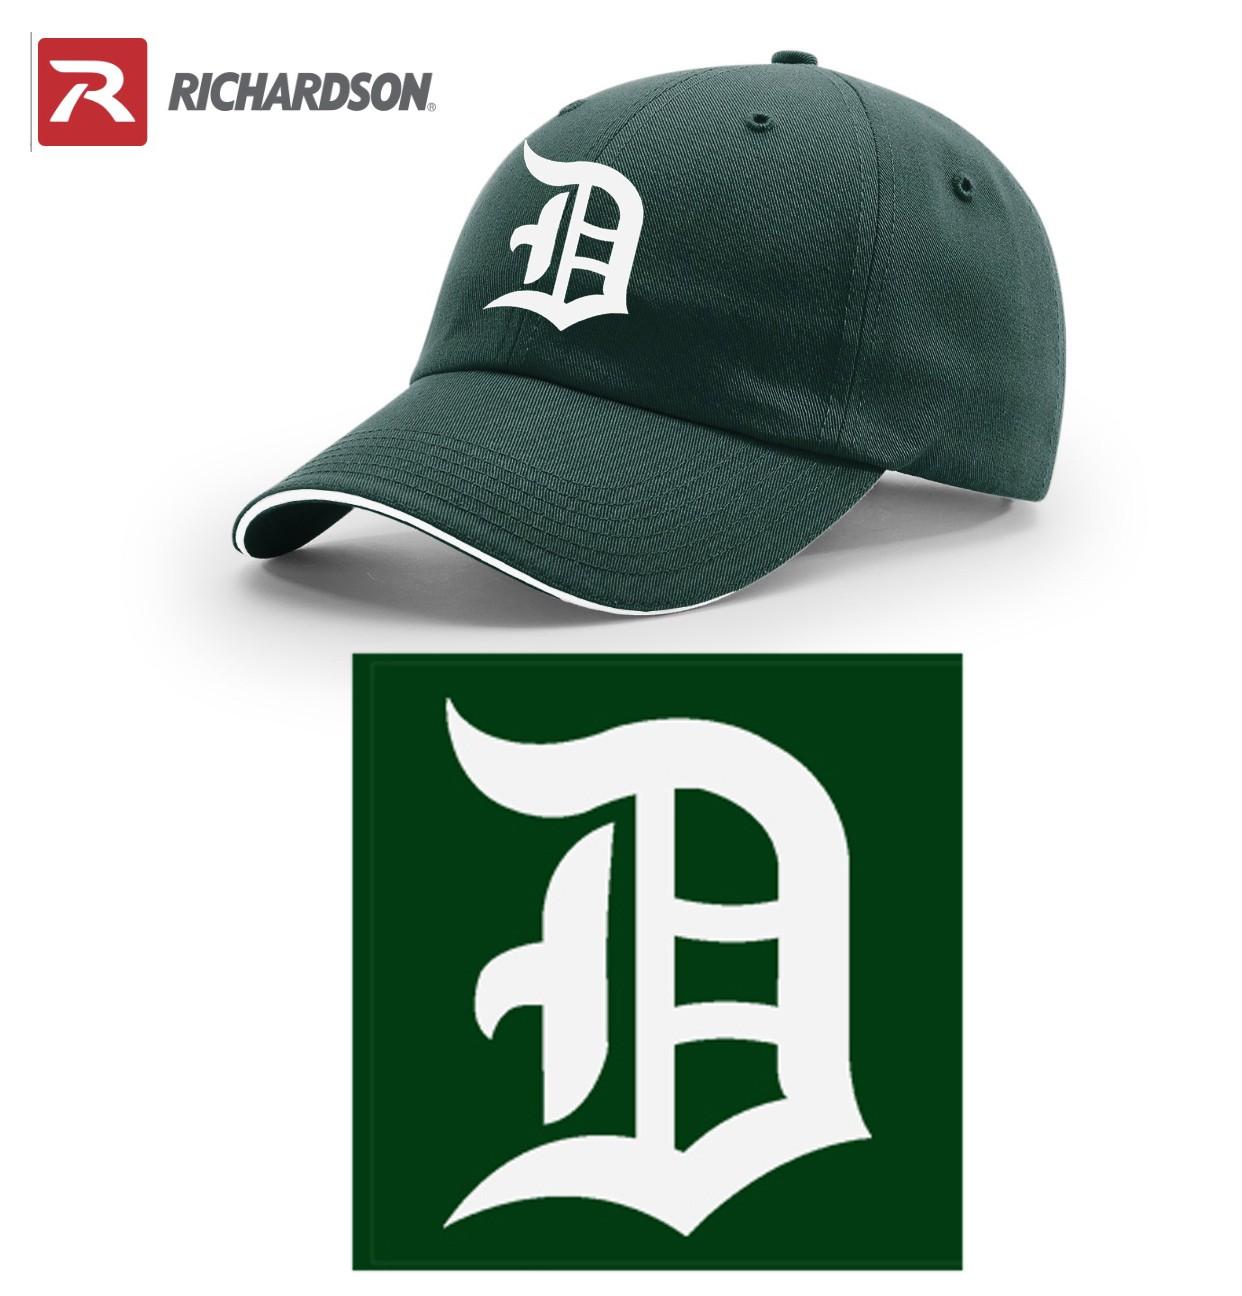 Duxbury Youth Baseball Richardson R-Series R66 Unstructured Sandwich Visor Cap, EMBROIDERED